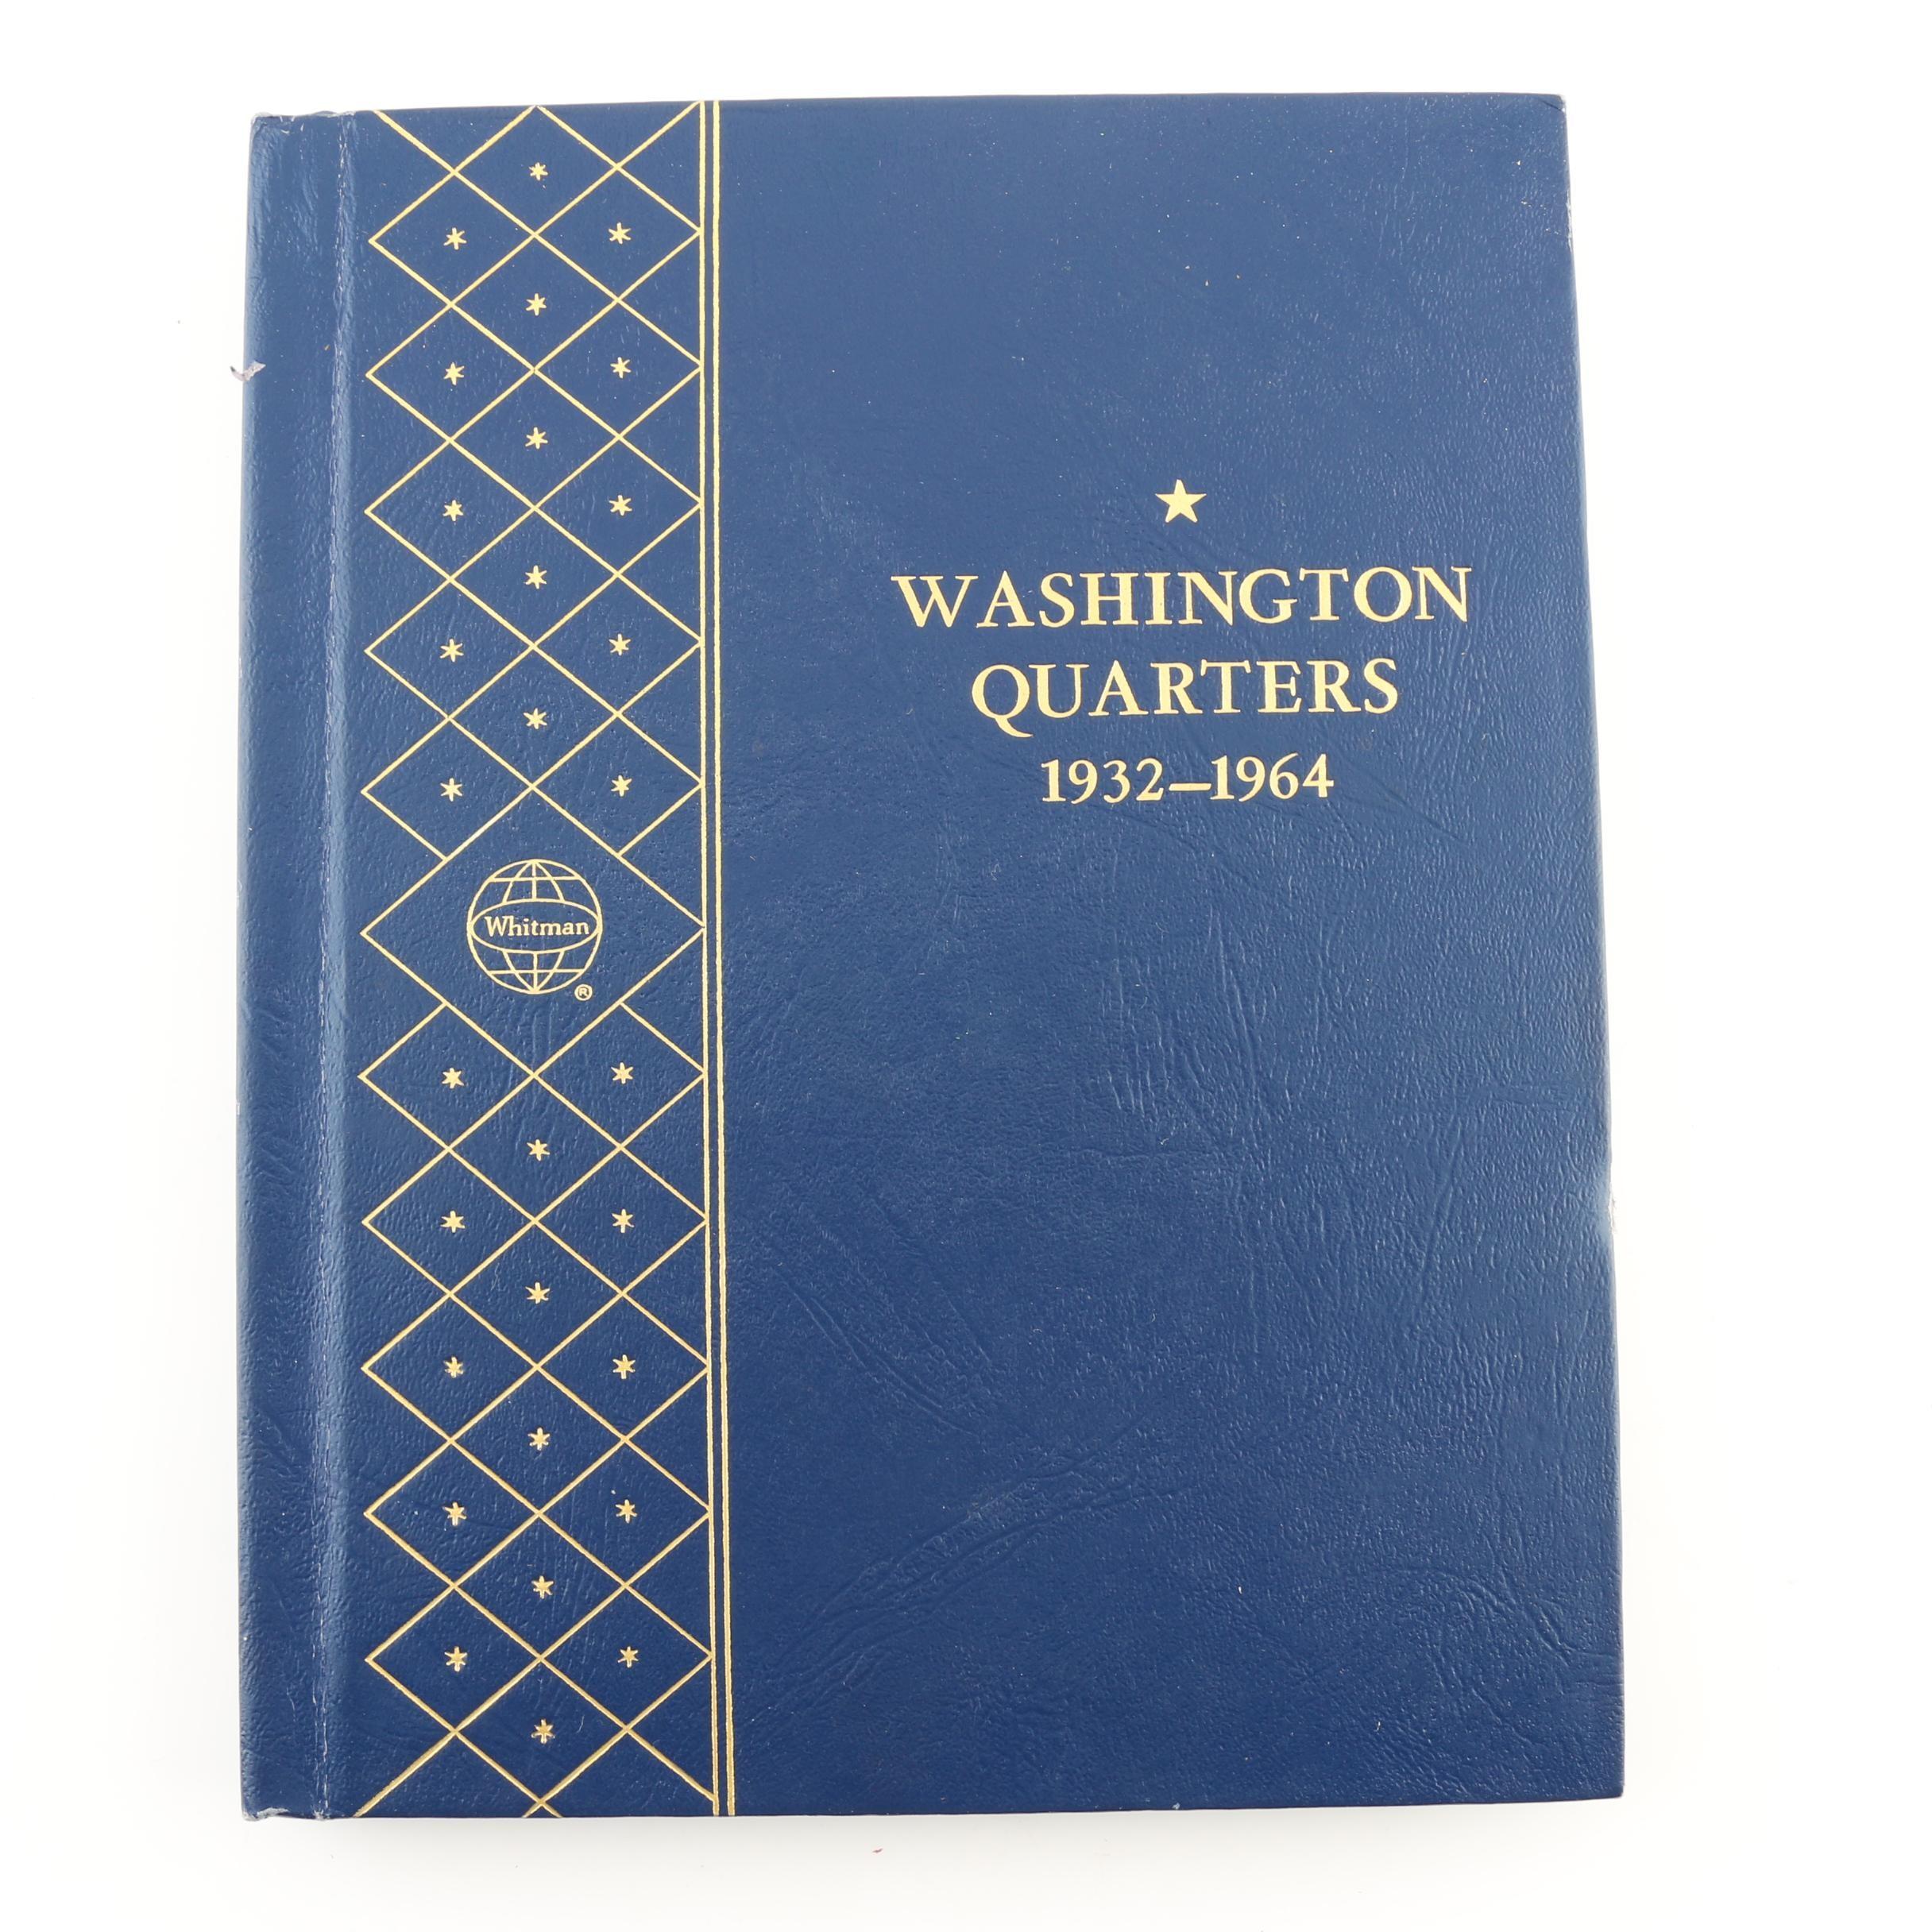 Complete Whitman Binder of Washington Silver Quarters, 1932-1964